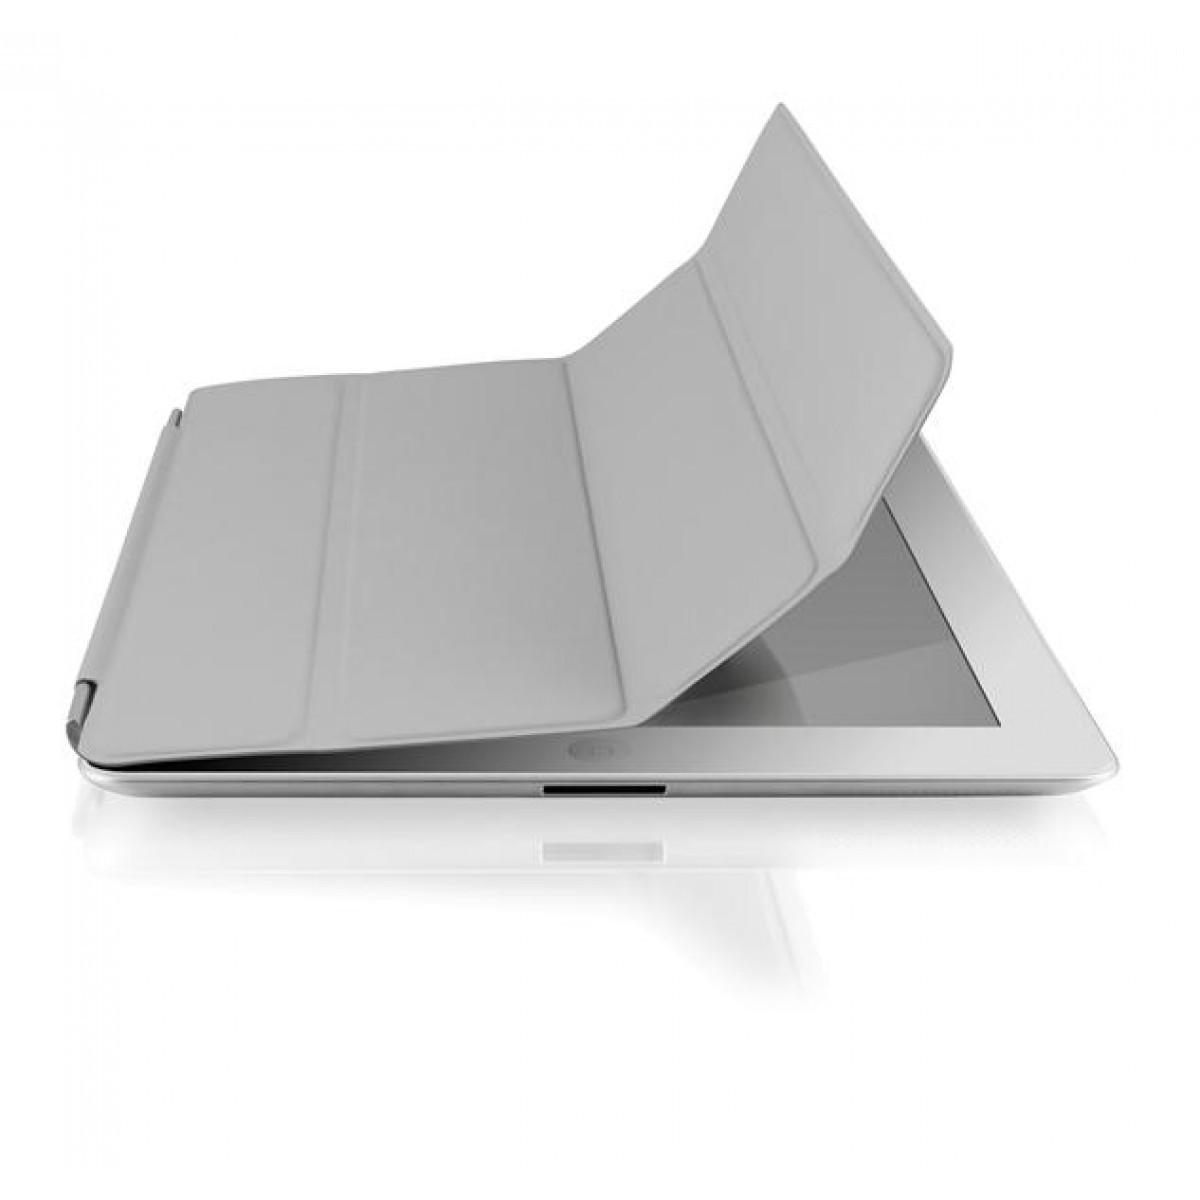 Capa Smart Cover Magnética p/ Ipad 2 e 3 BO162